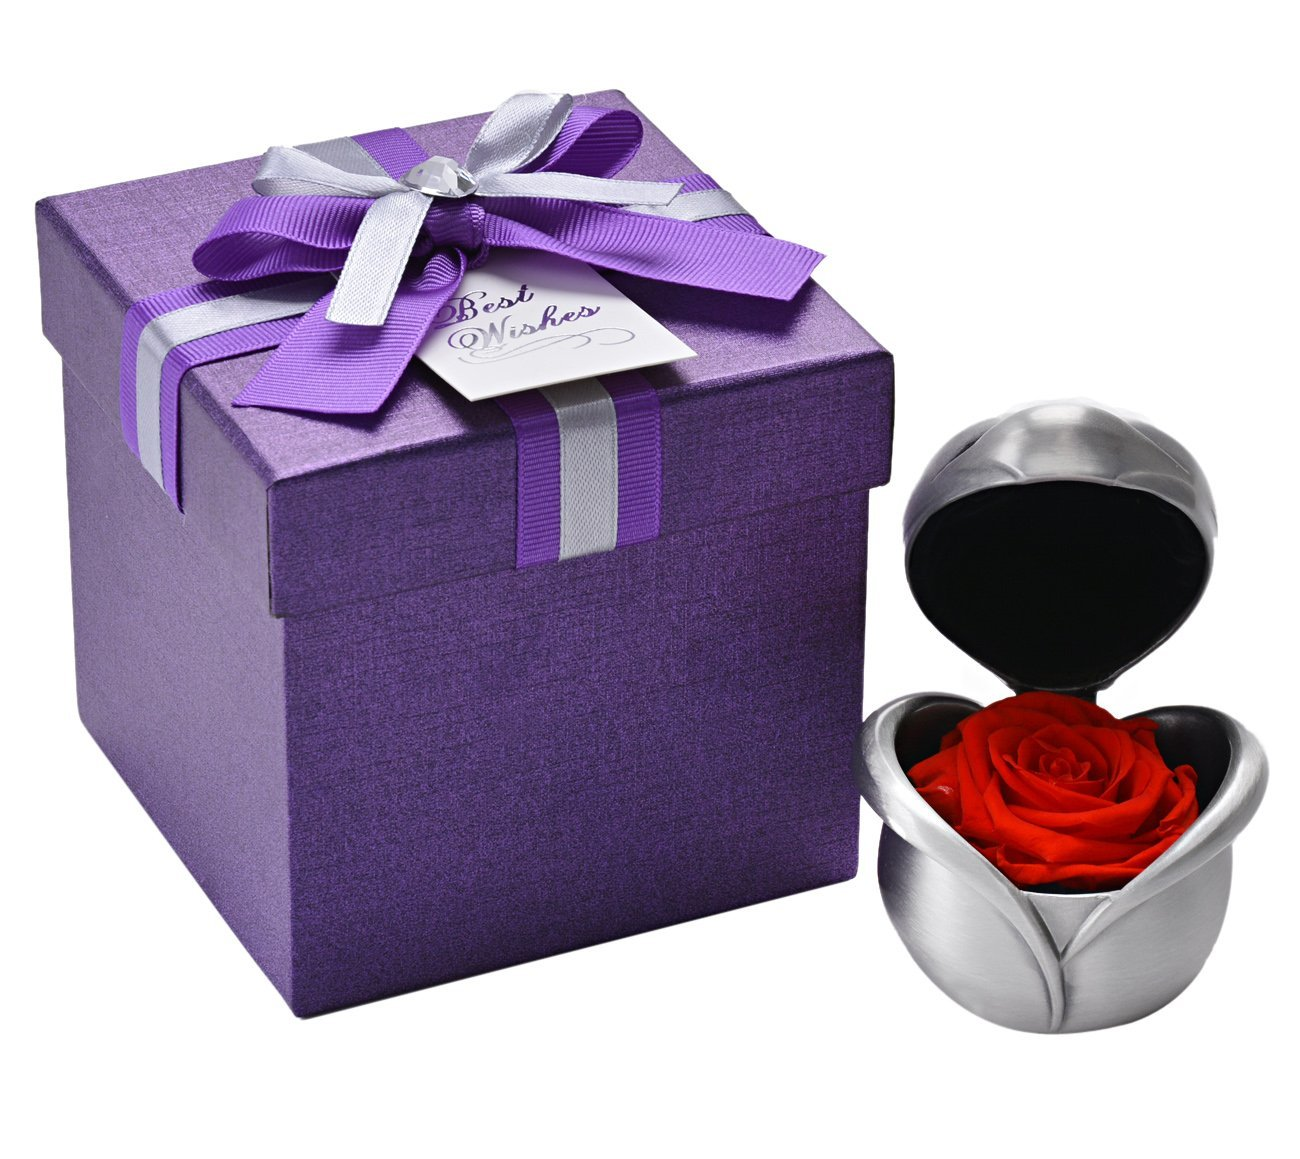 Rose day -Gifts -V15